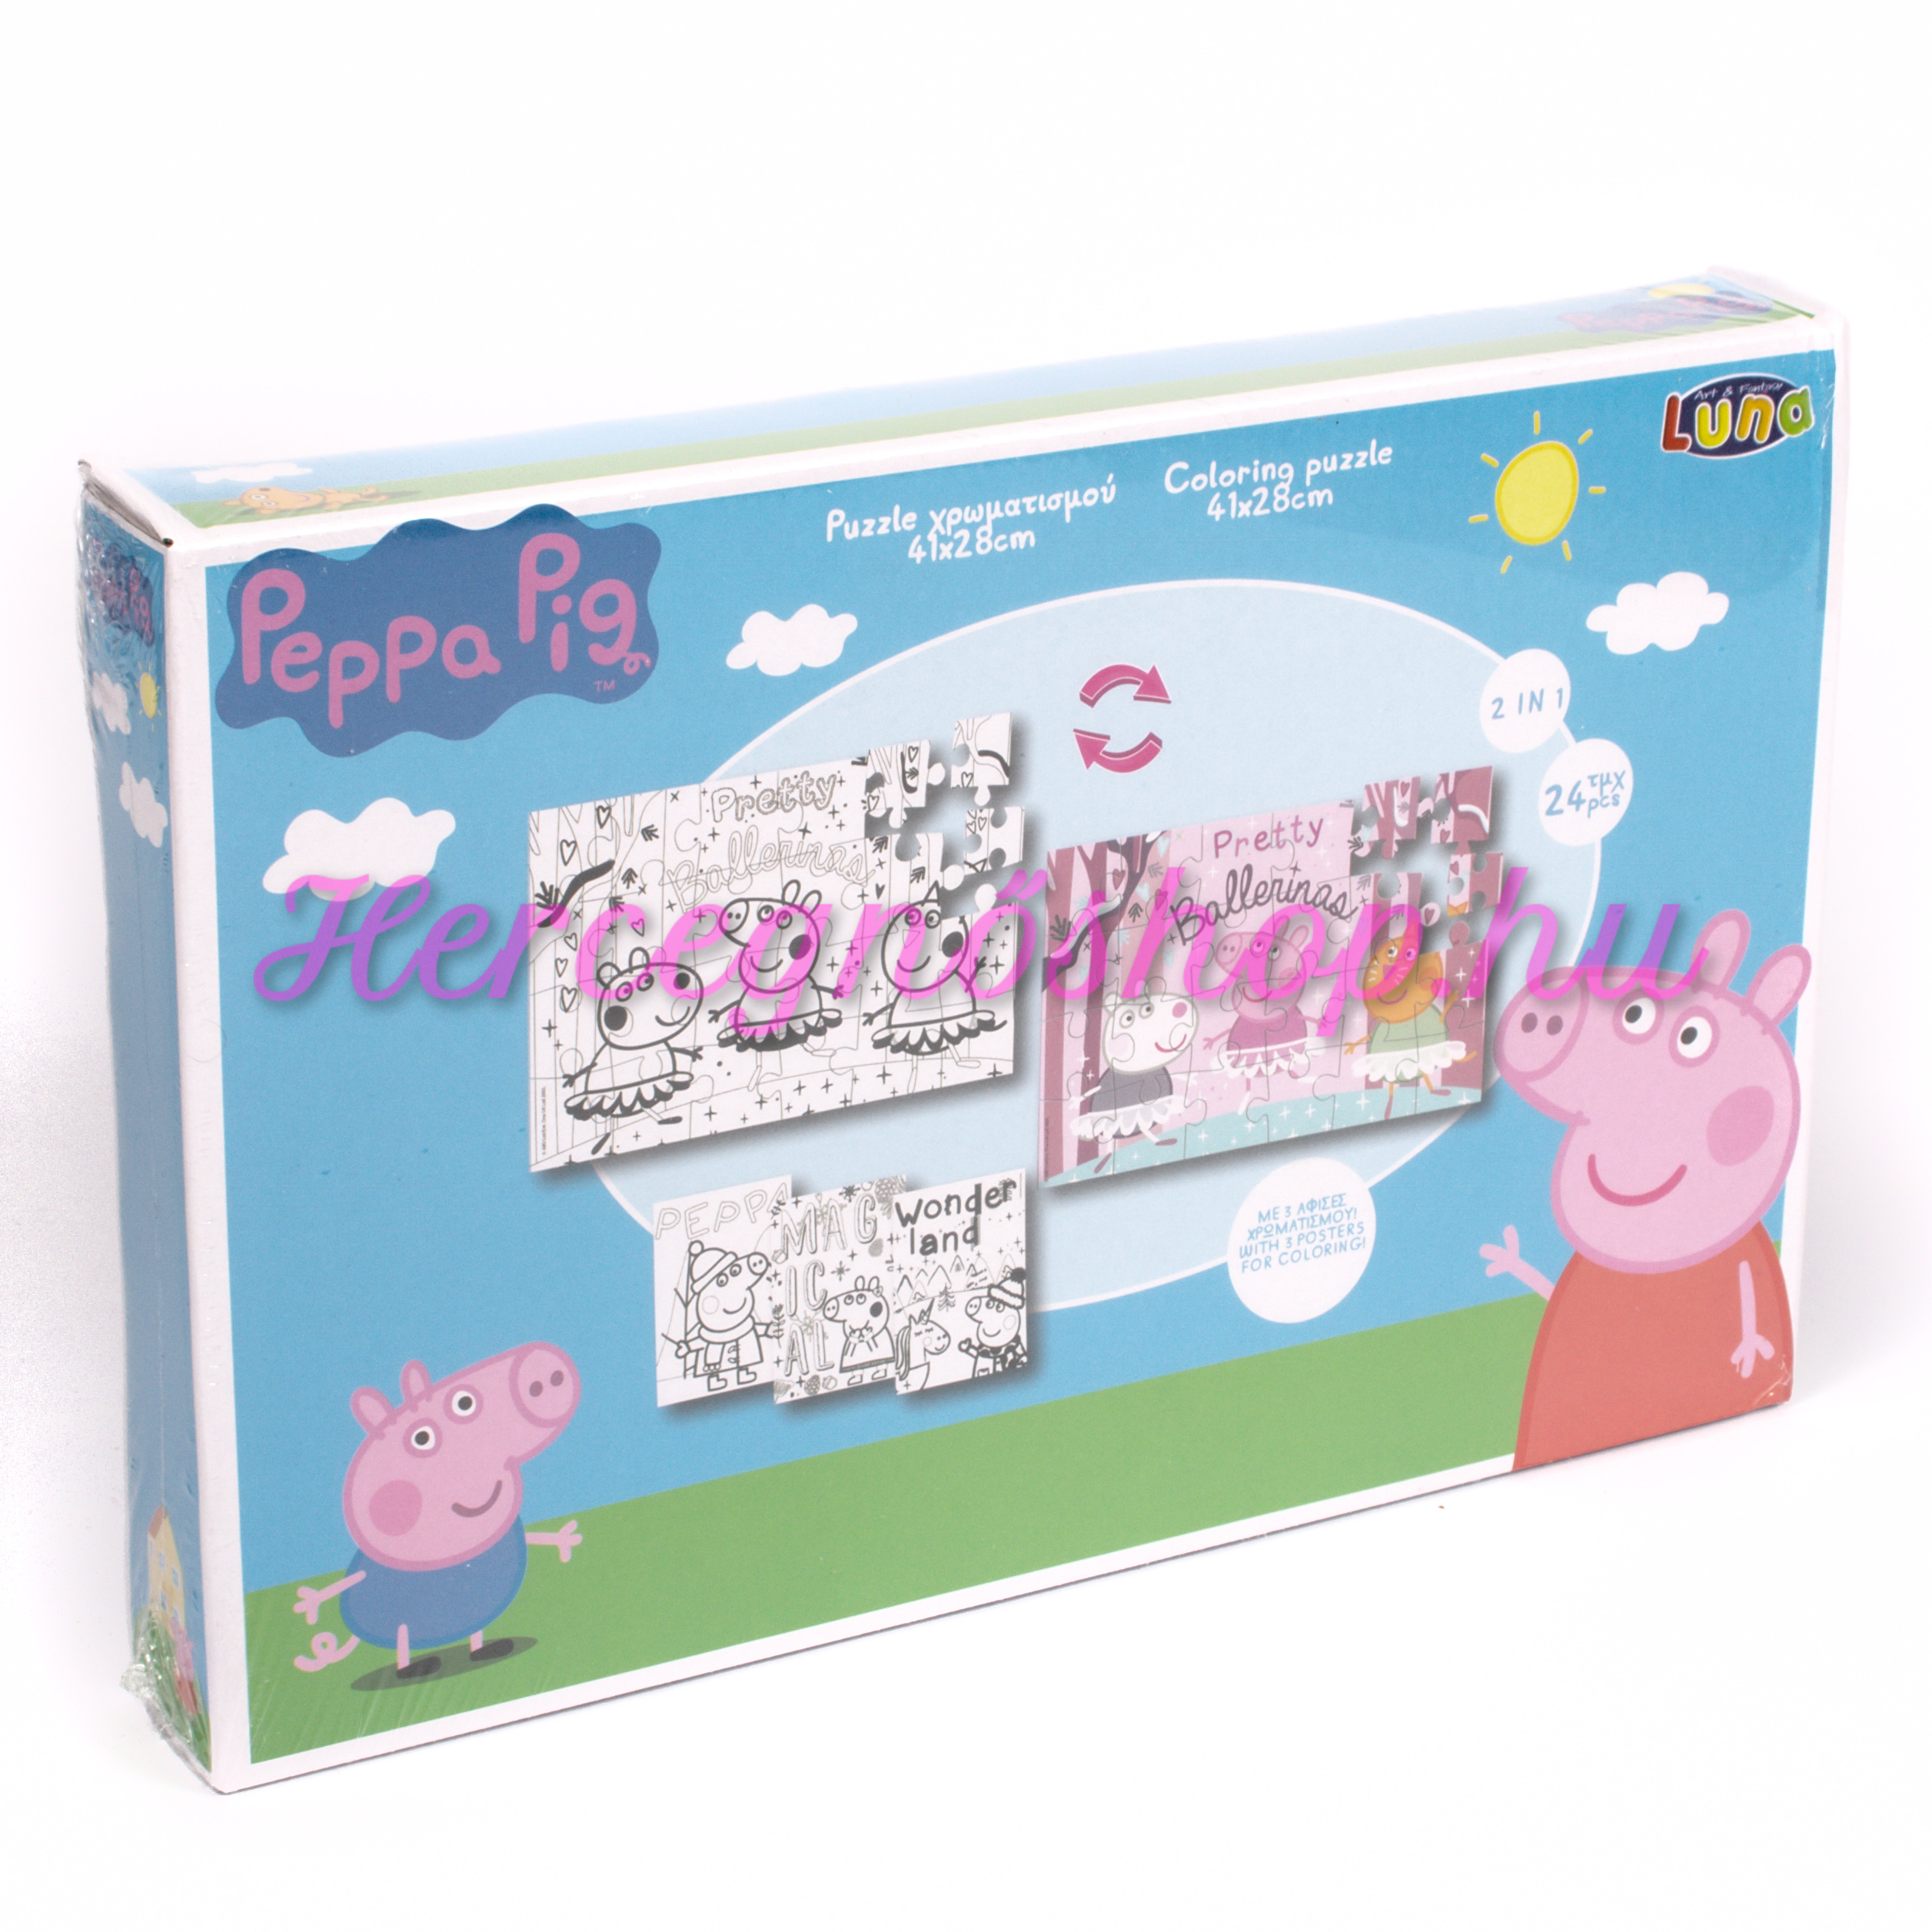 Peppa malac színezhető kirakó (Peppa Pig)